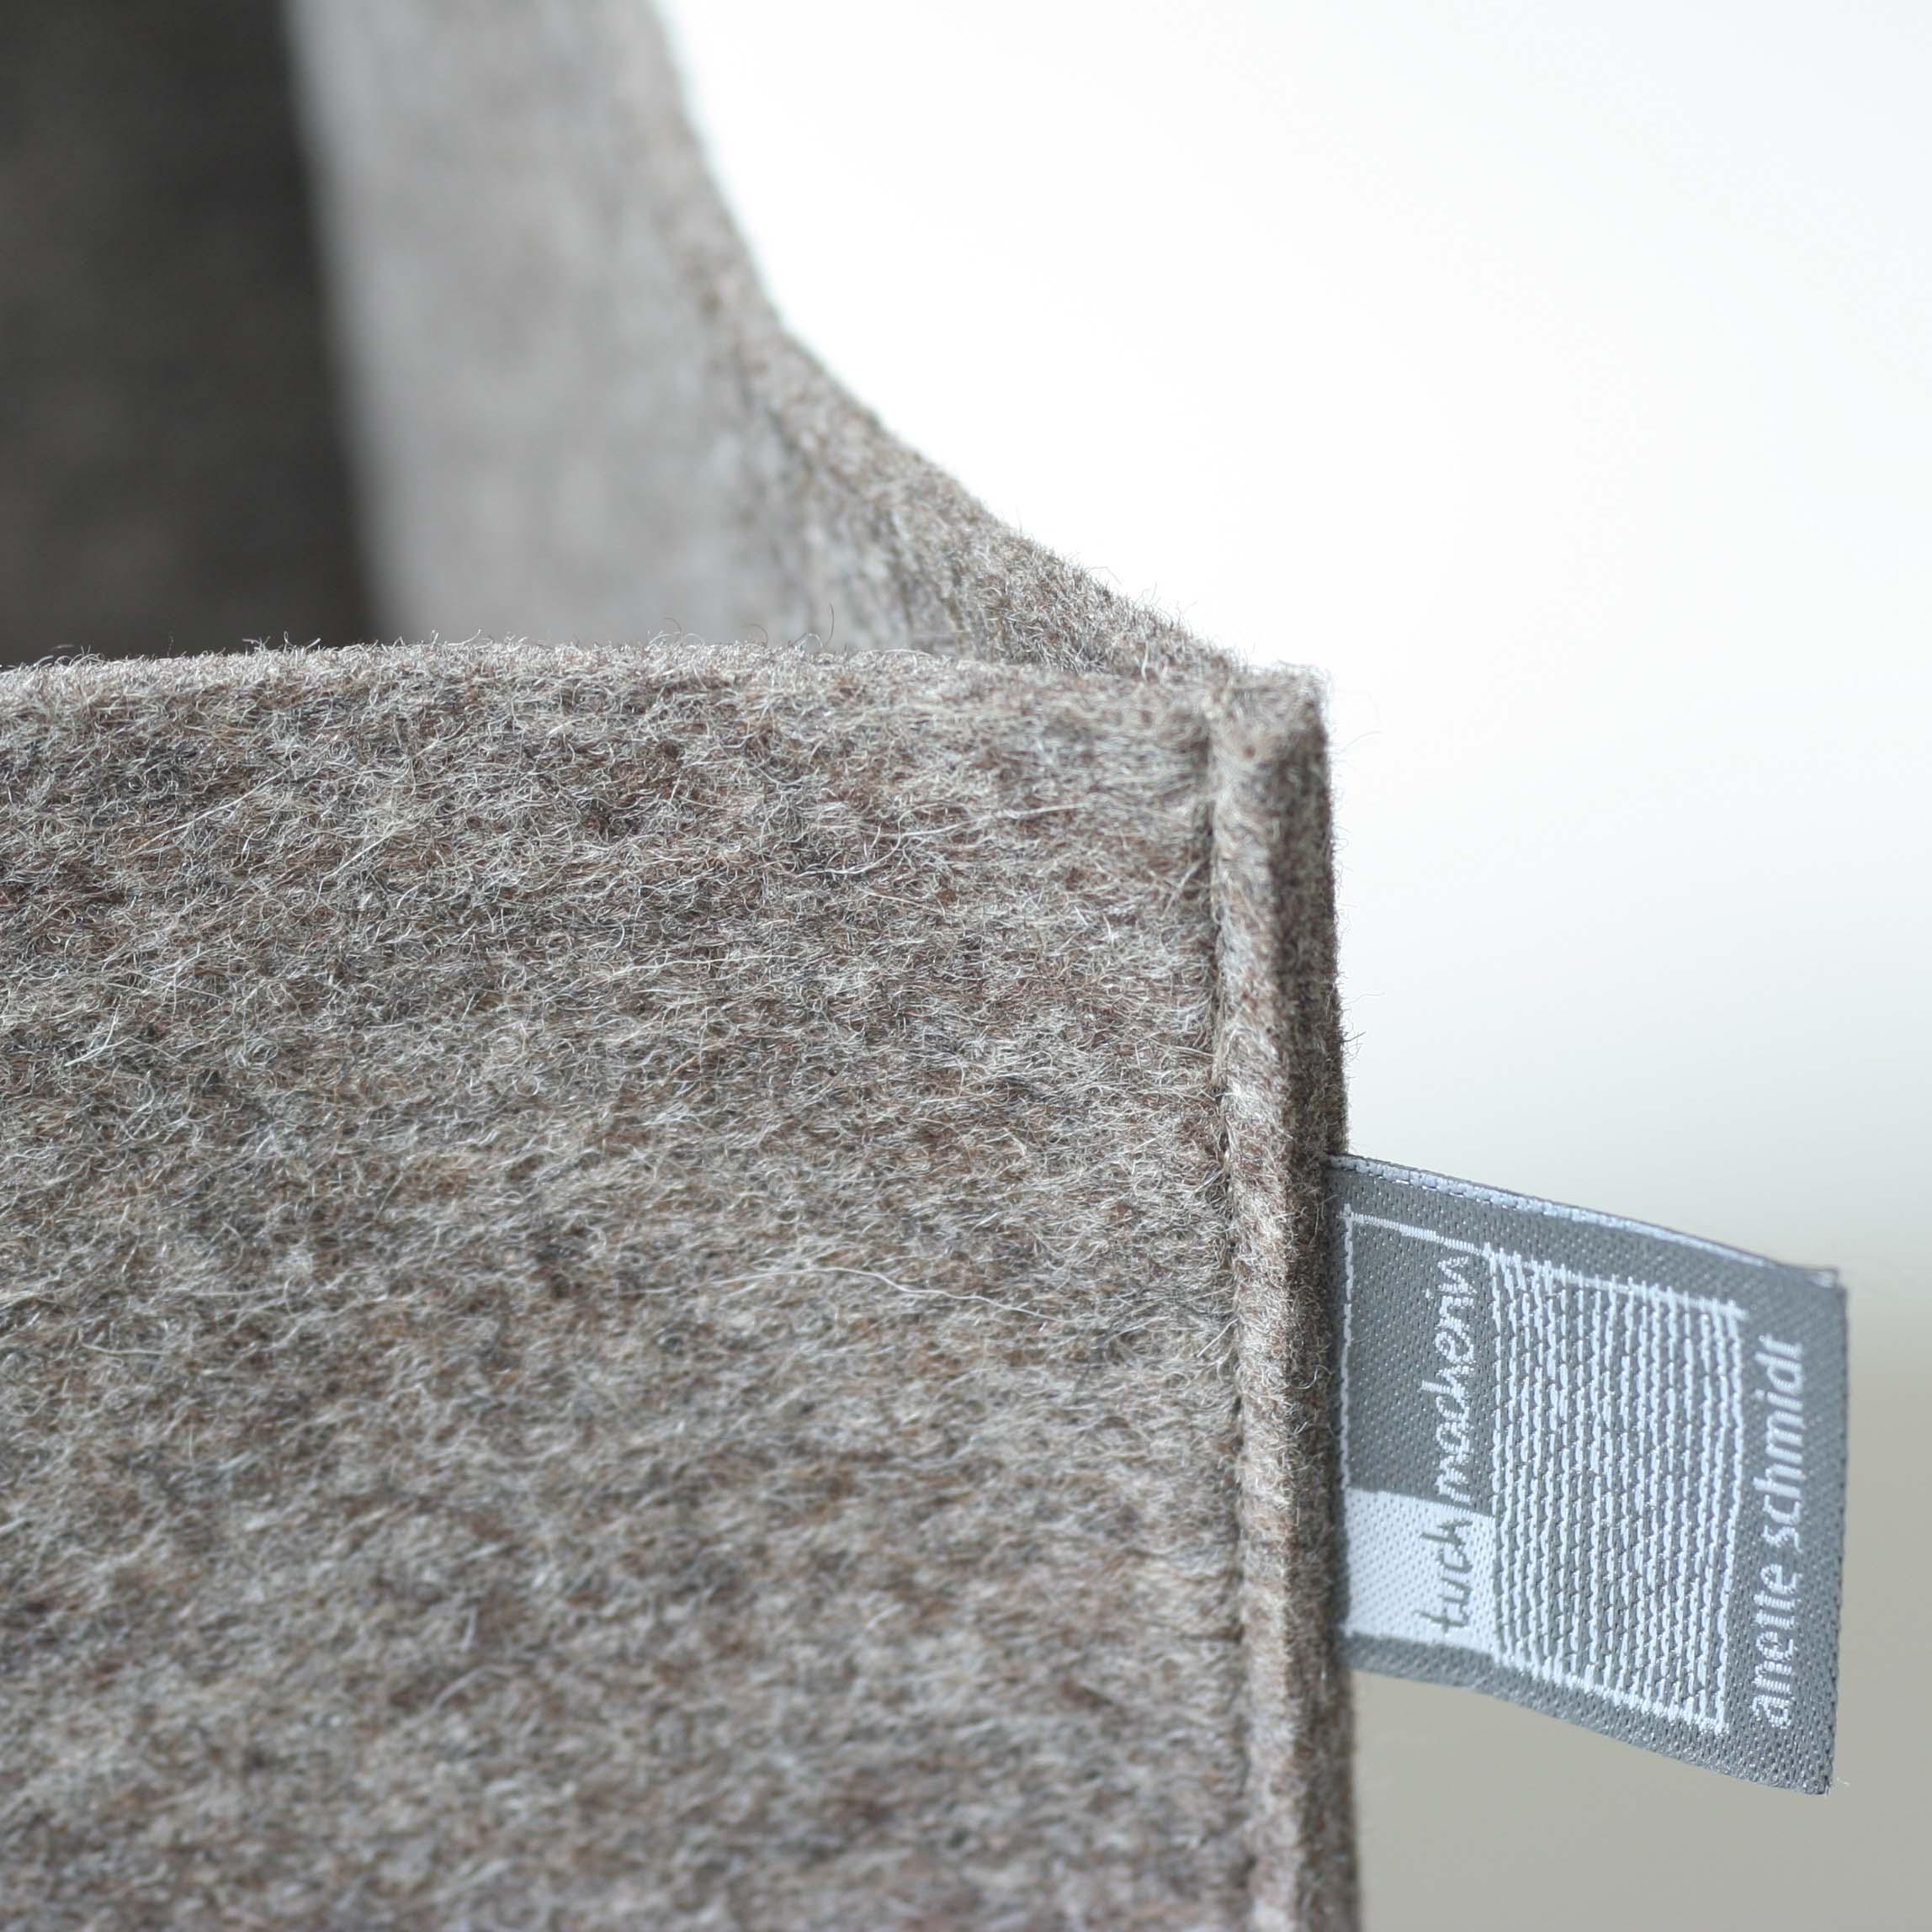 filzkorb grau braun filzk rbe aufbewahrungsk rbe tuchmacherin. Black Bedroom Furniture Sets. Home Design Ideas